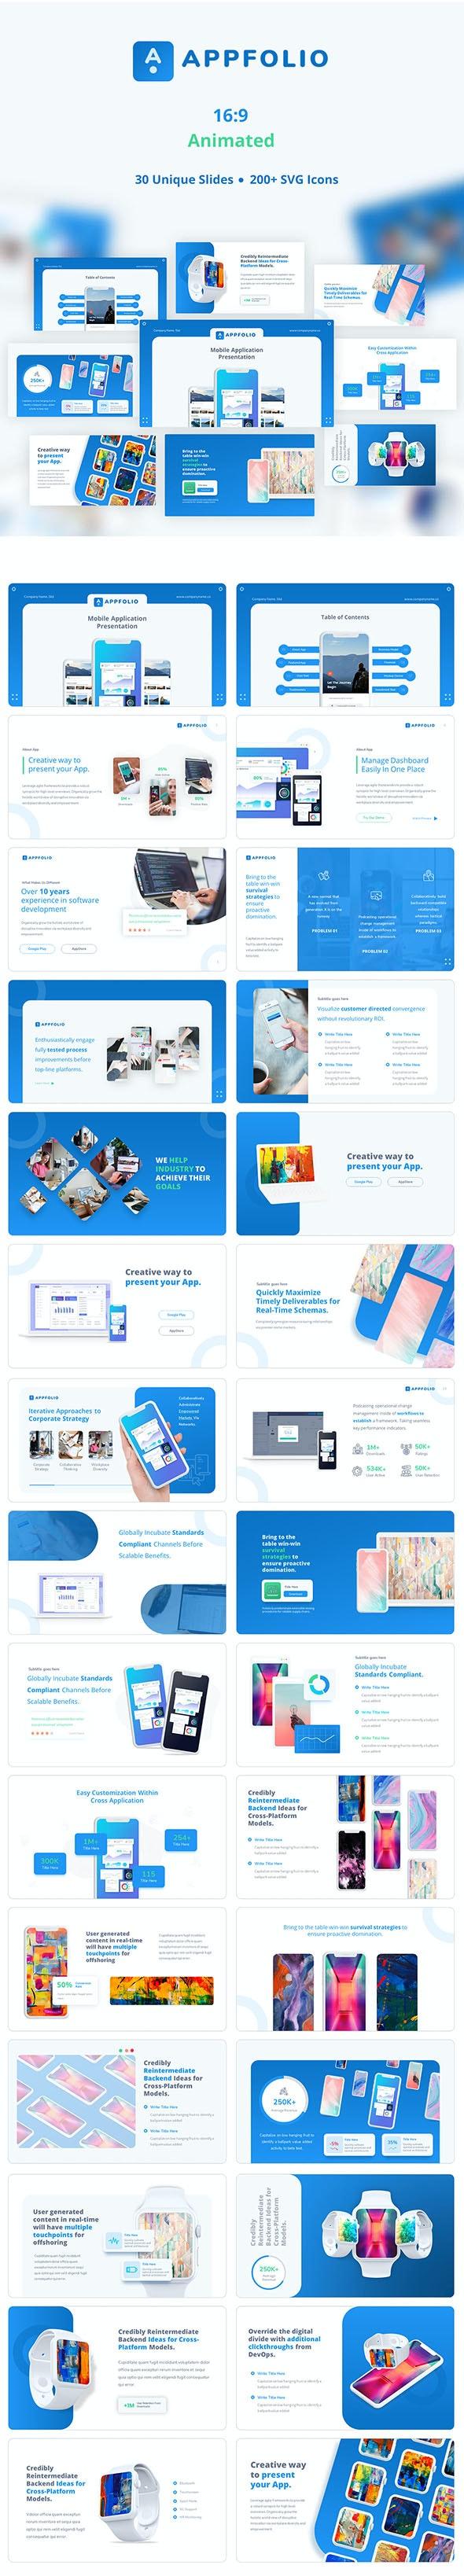 AppFolio – Portfolio Presentation Mockup - Business PowerPoint Templates